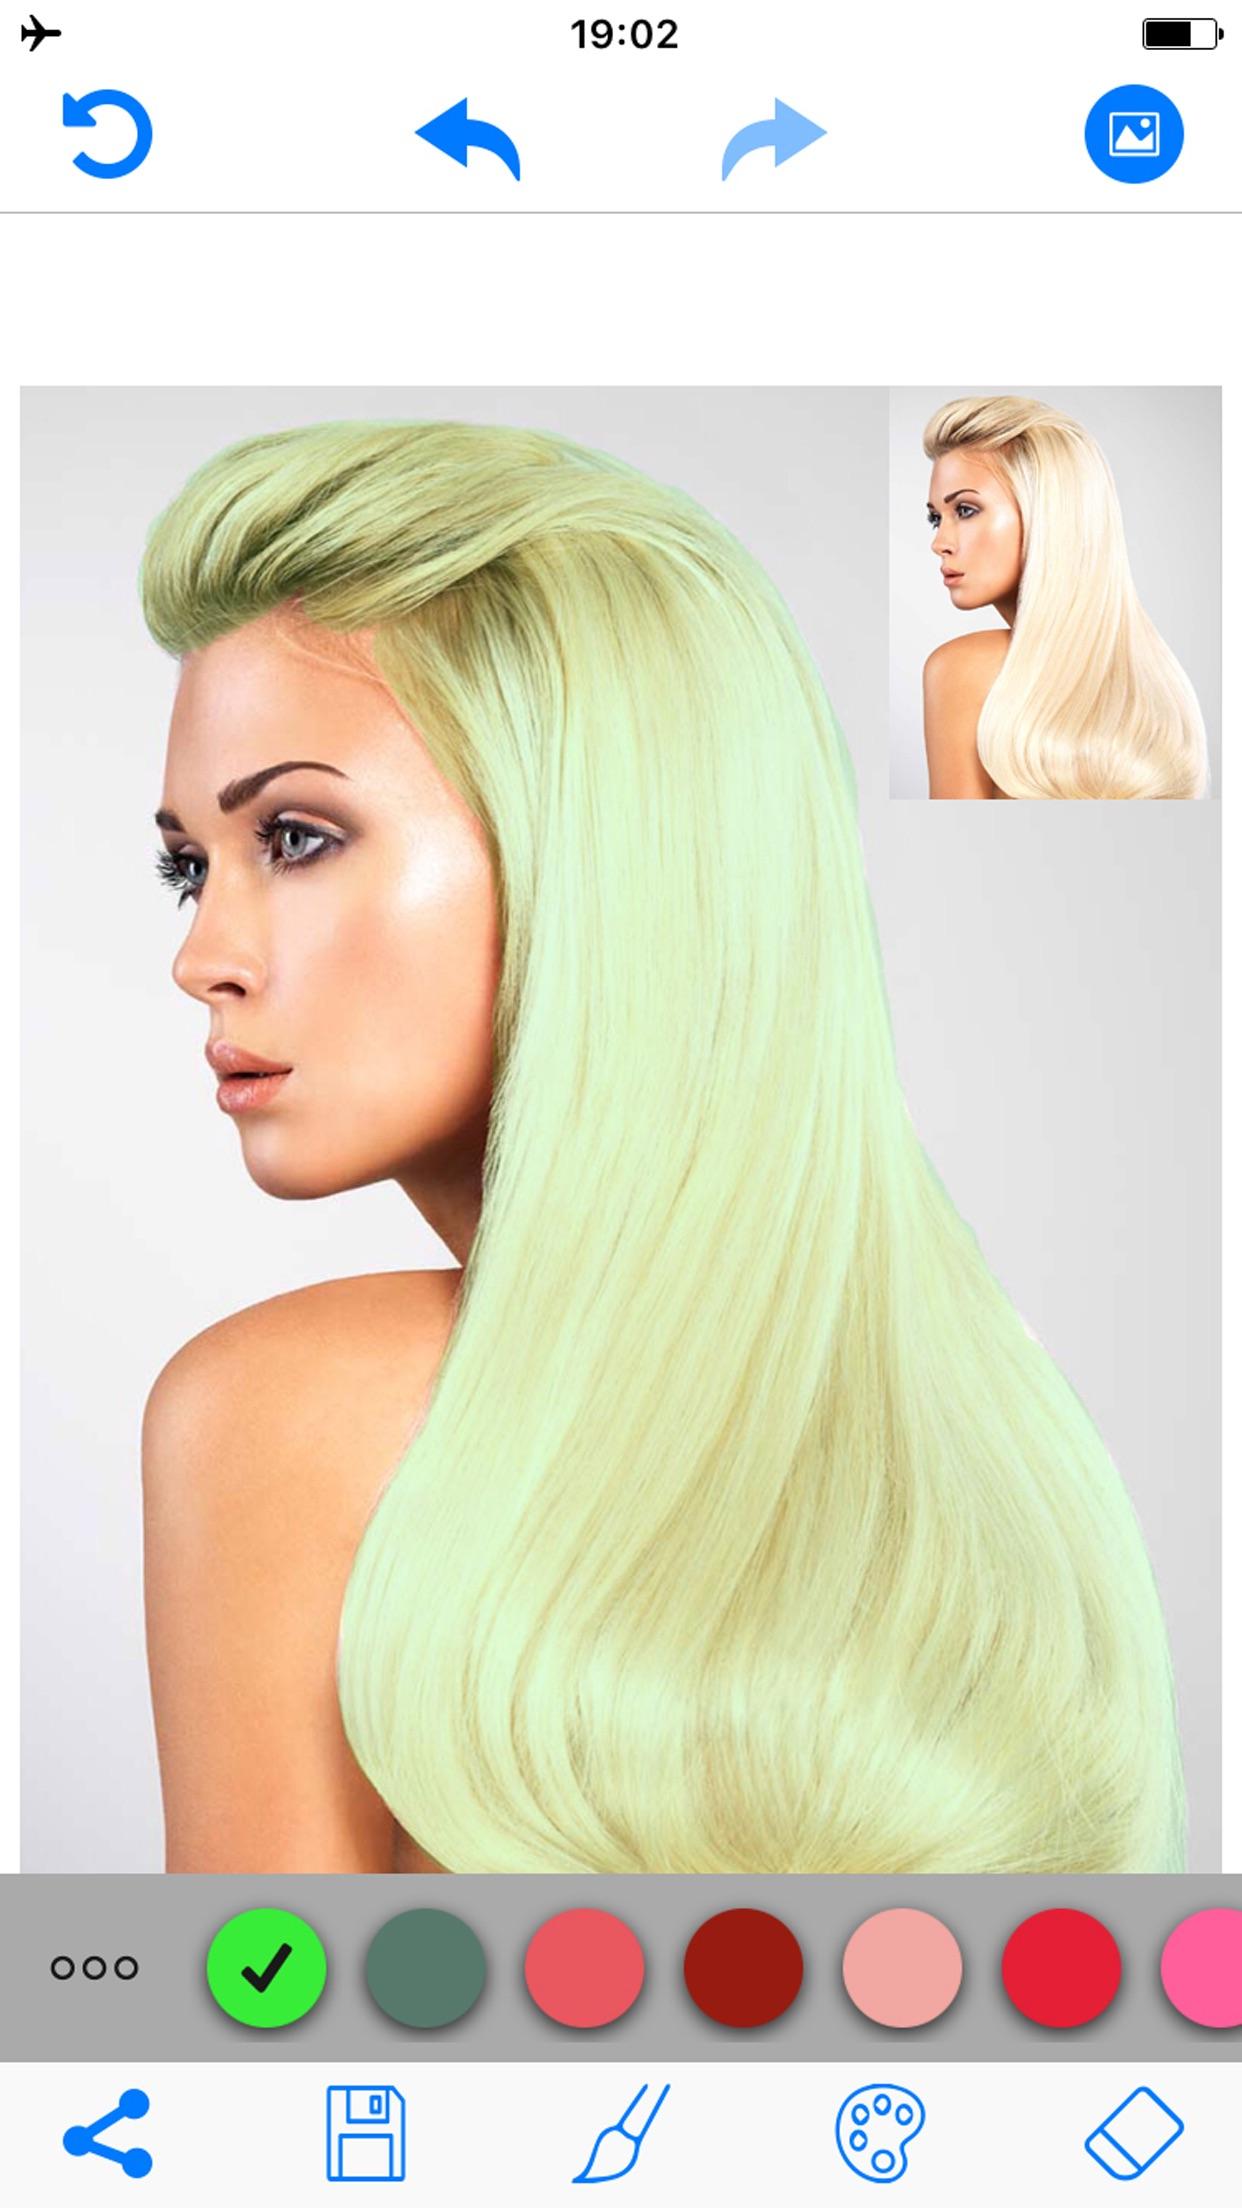 Hair Color Changer Salon Booth Screenshot